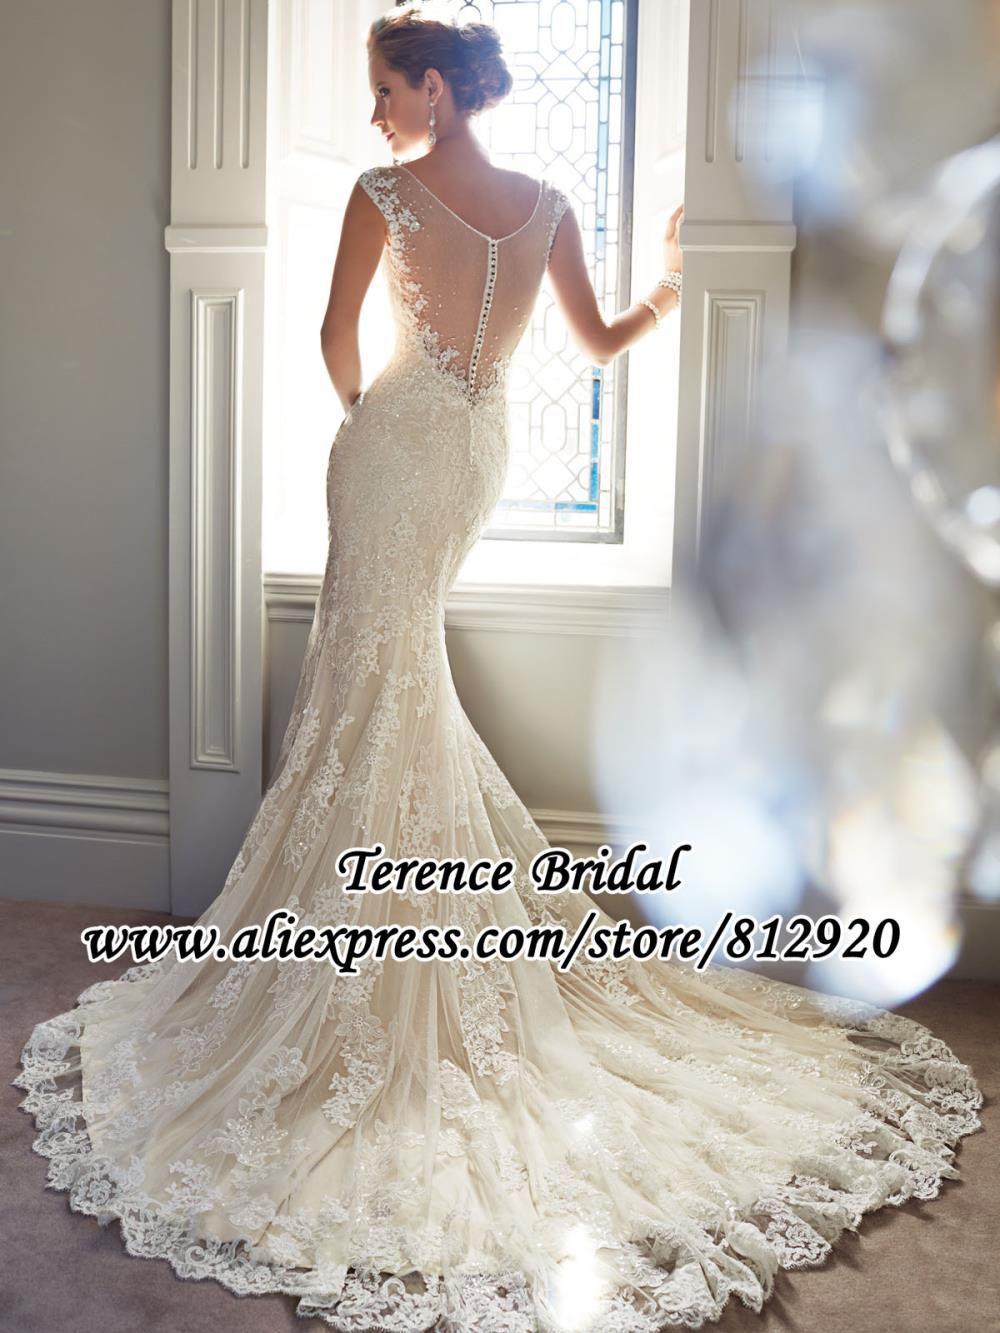 2019 Custom Size Celebrity Dress Long Sleeve V-neck Myriam Fares Friend Tube Knee Length Bridesmaid Dresses Weddings & Events Bridesmaid Dresses